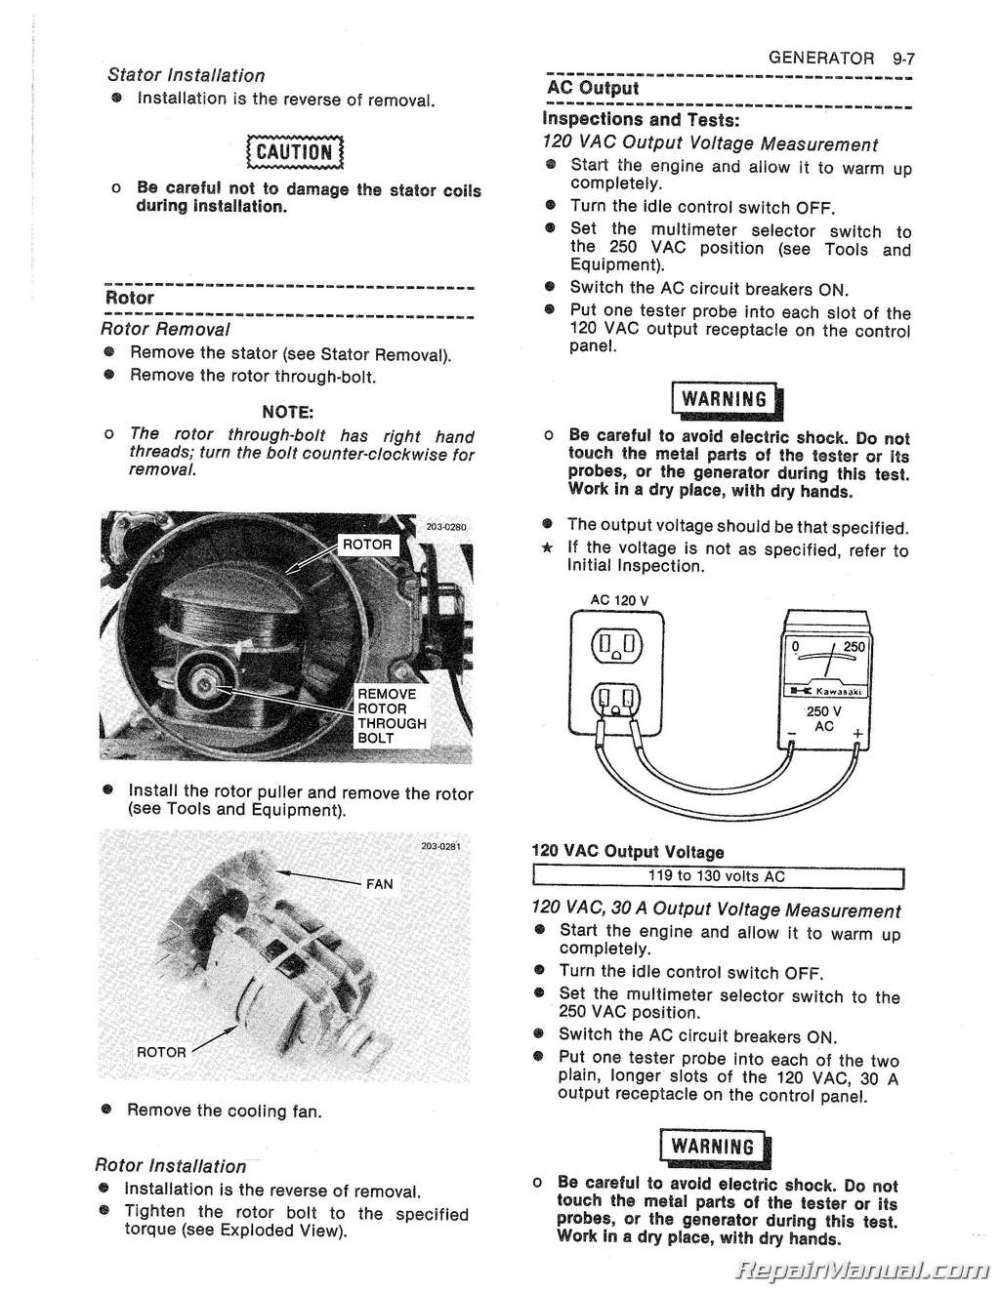 medium resolution of kawasaki generator wiring diagram wiring diagram paper kawasaki generator wiring diagram